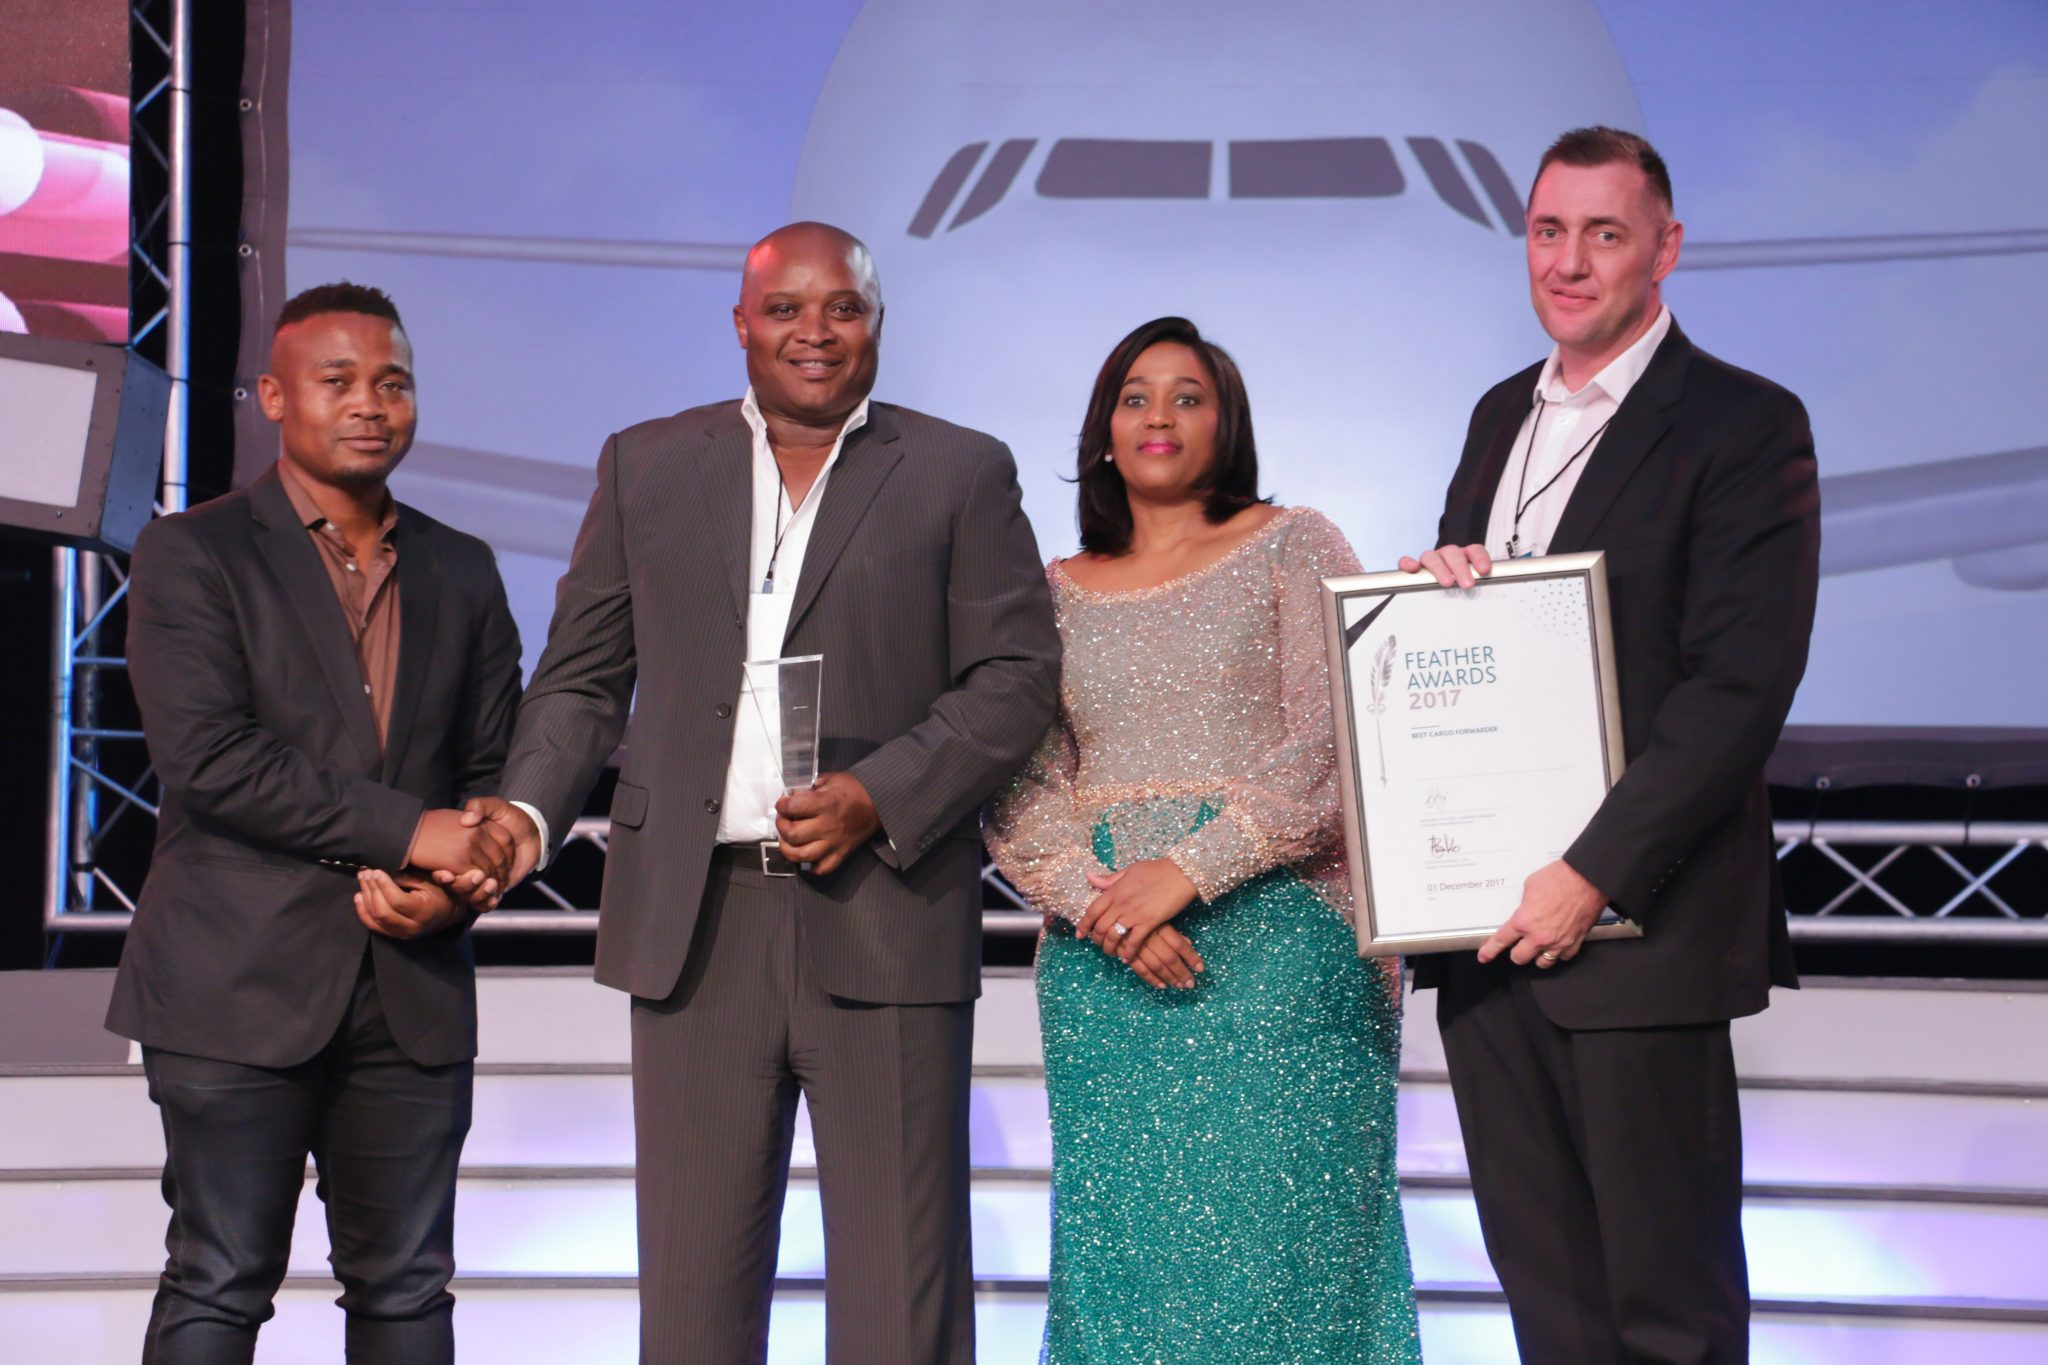 Airport Ads wins ACSA Feather Awards